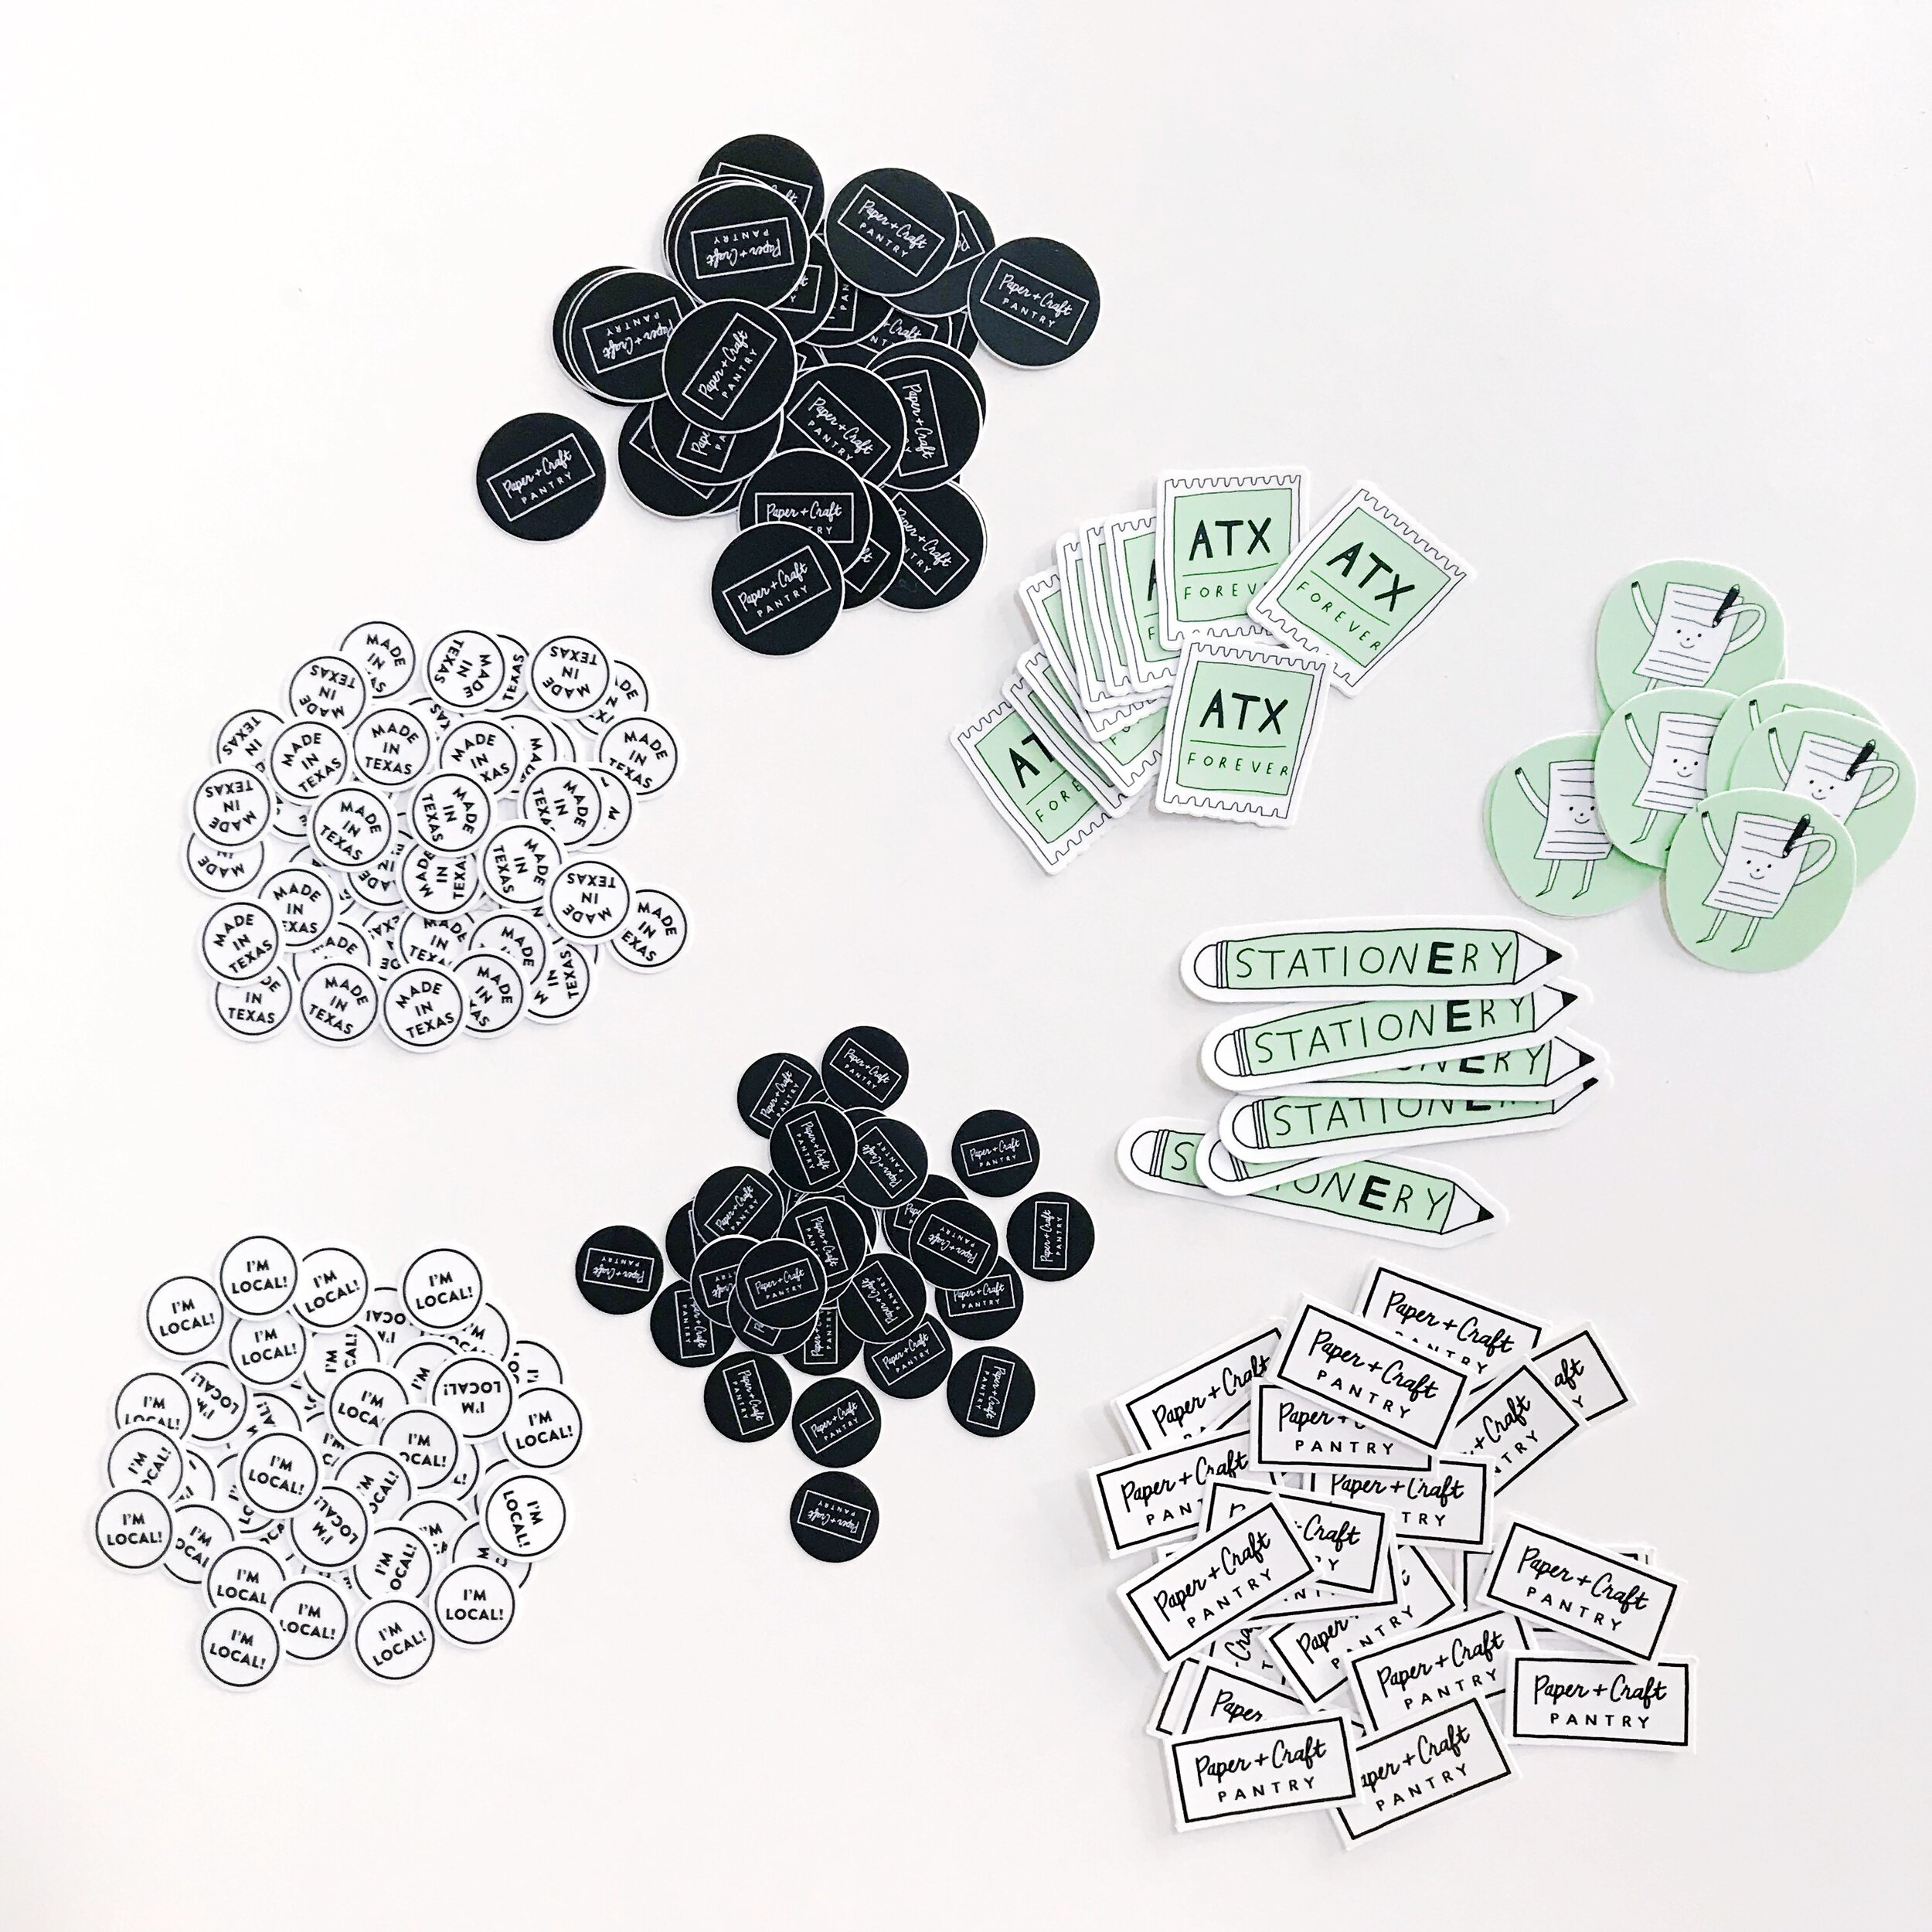 papercraftpantry-blog-smallbusiness-stickers-marketing.jpg